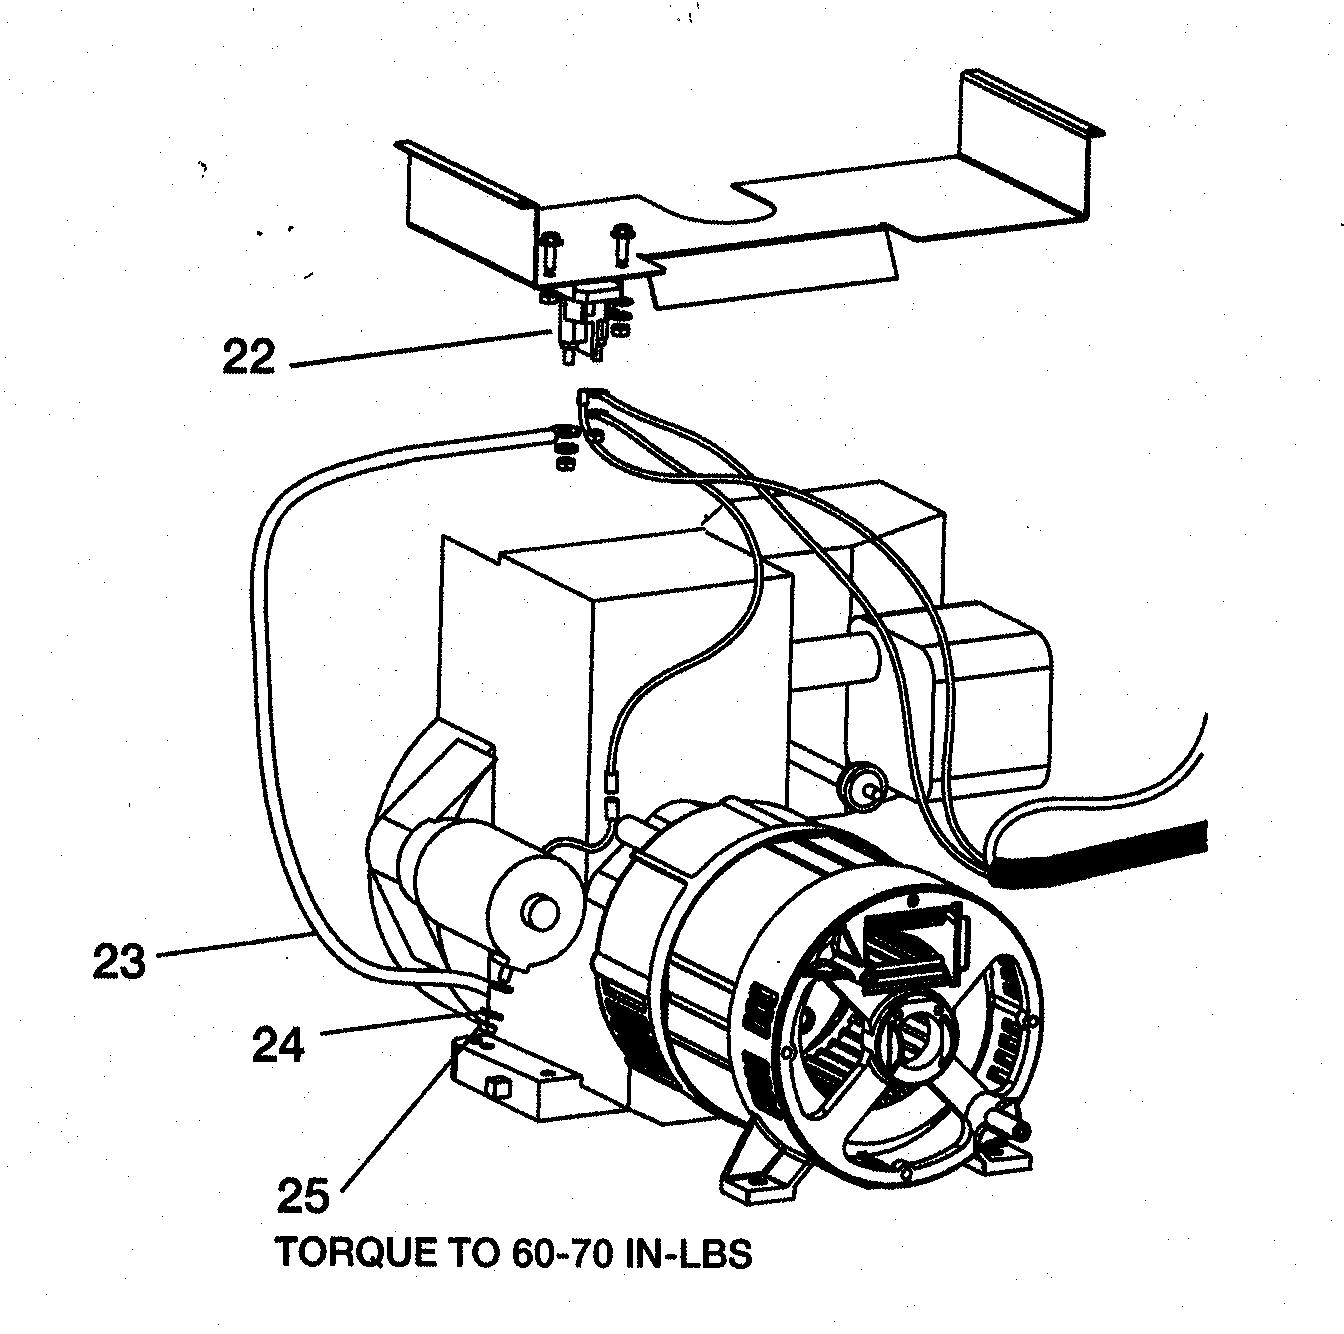 480 Volt 3 Phase Motor Wiring Diagram Besides 480 Volt